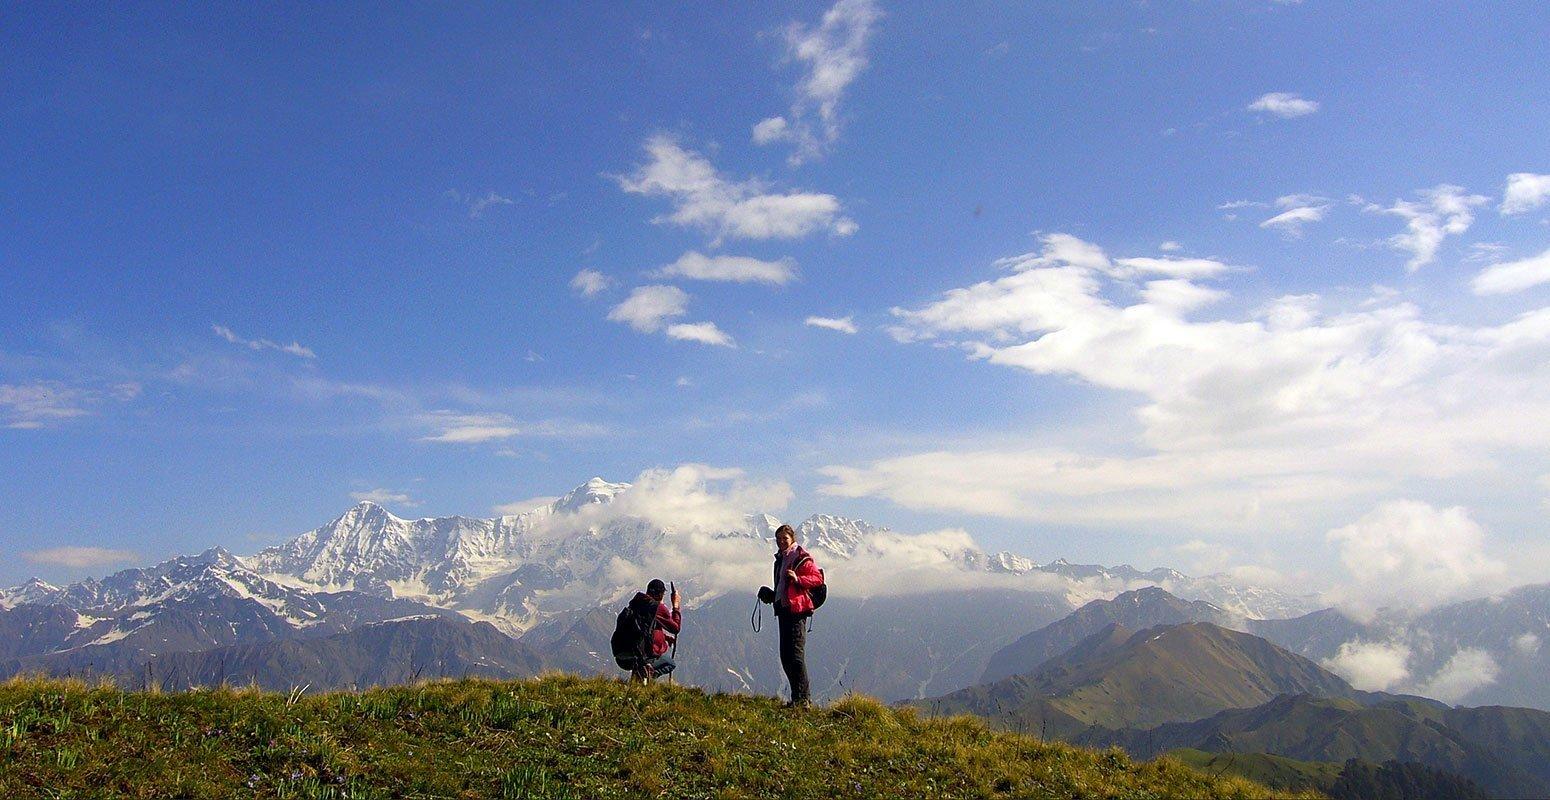 Trekking the Himalayas - Collection